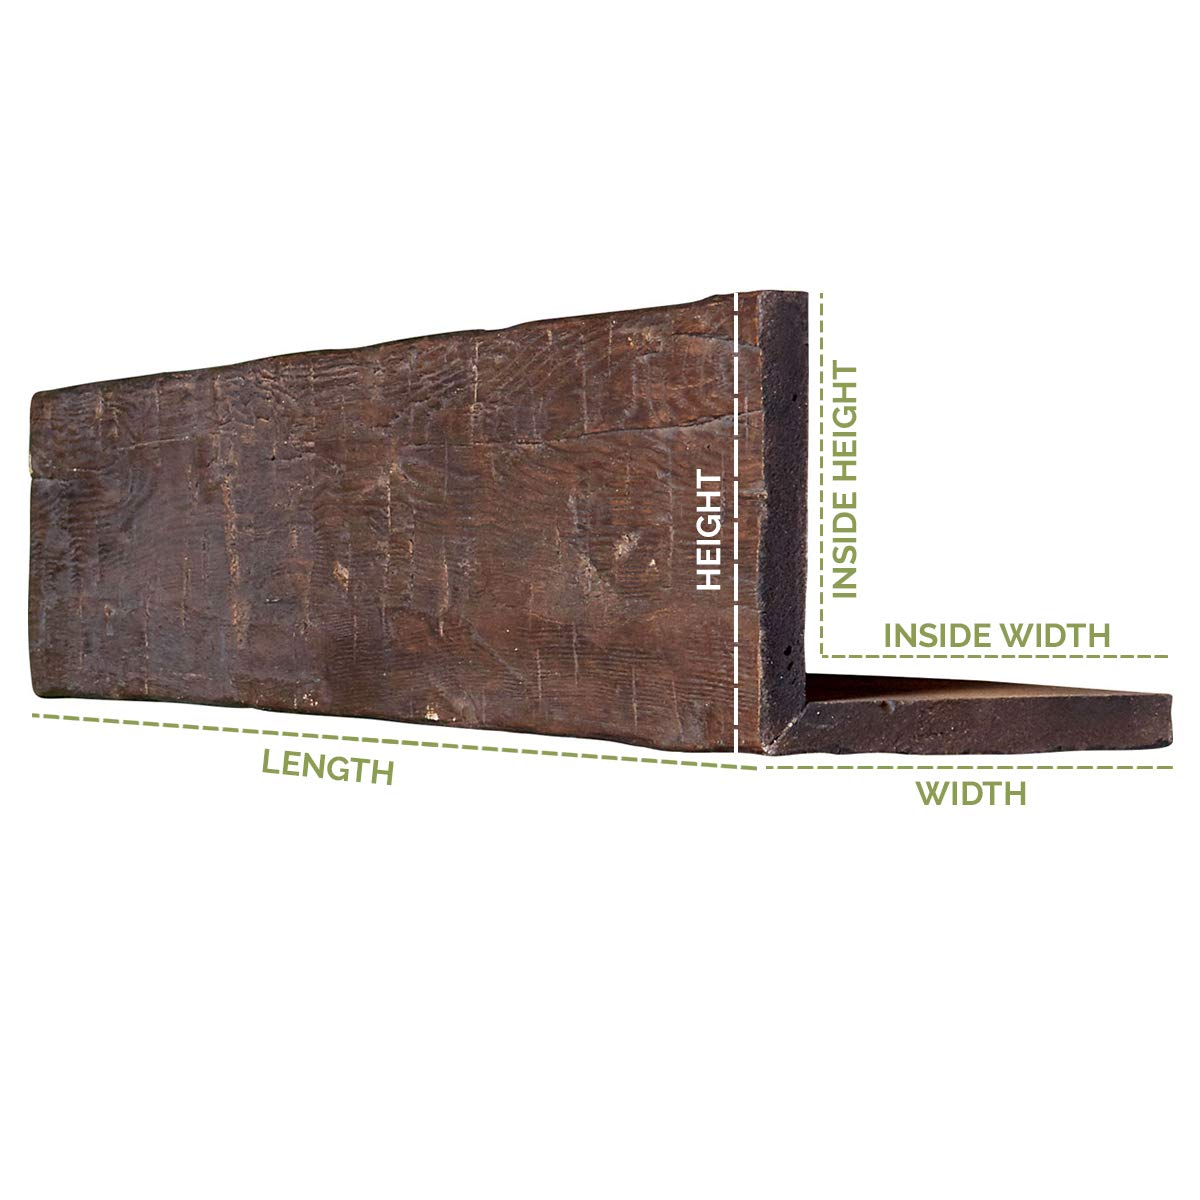 L-Beam Whitewash 6W x 10H x 12L 2-Sided Sandblasted Endurathane Faux Wood Ceiling Beam